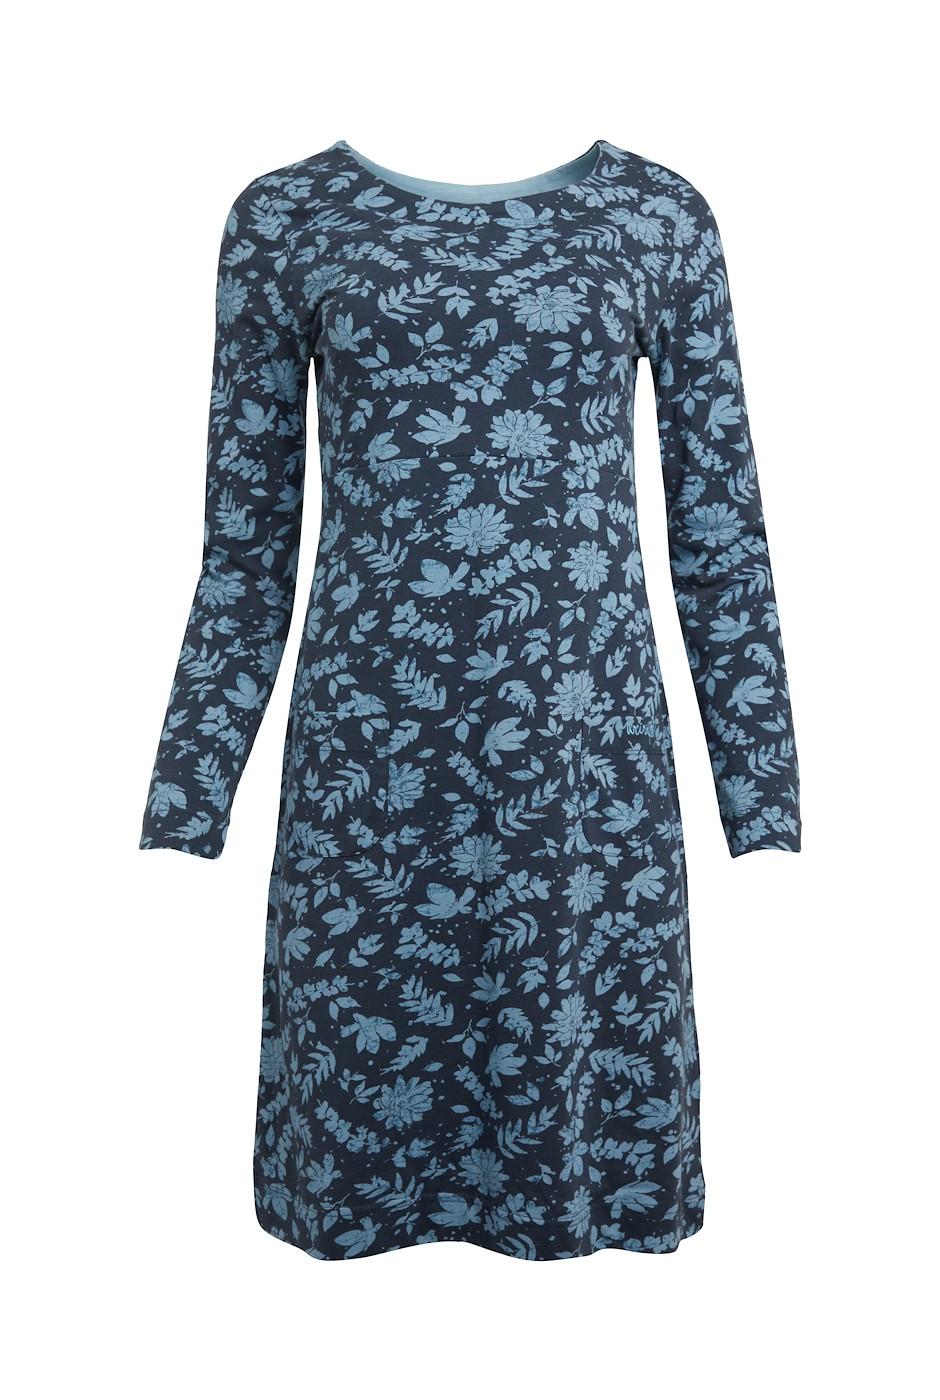 Delray Organic Cotton Jersey Dress Midnight